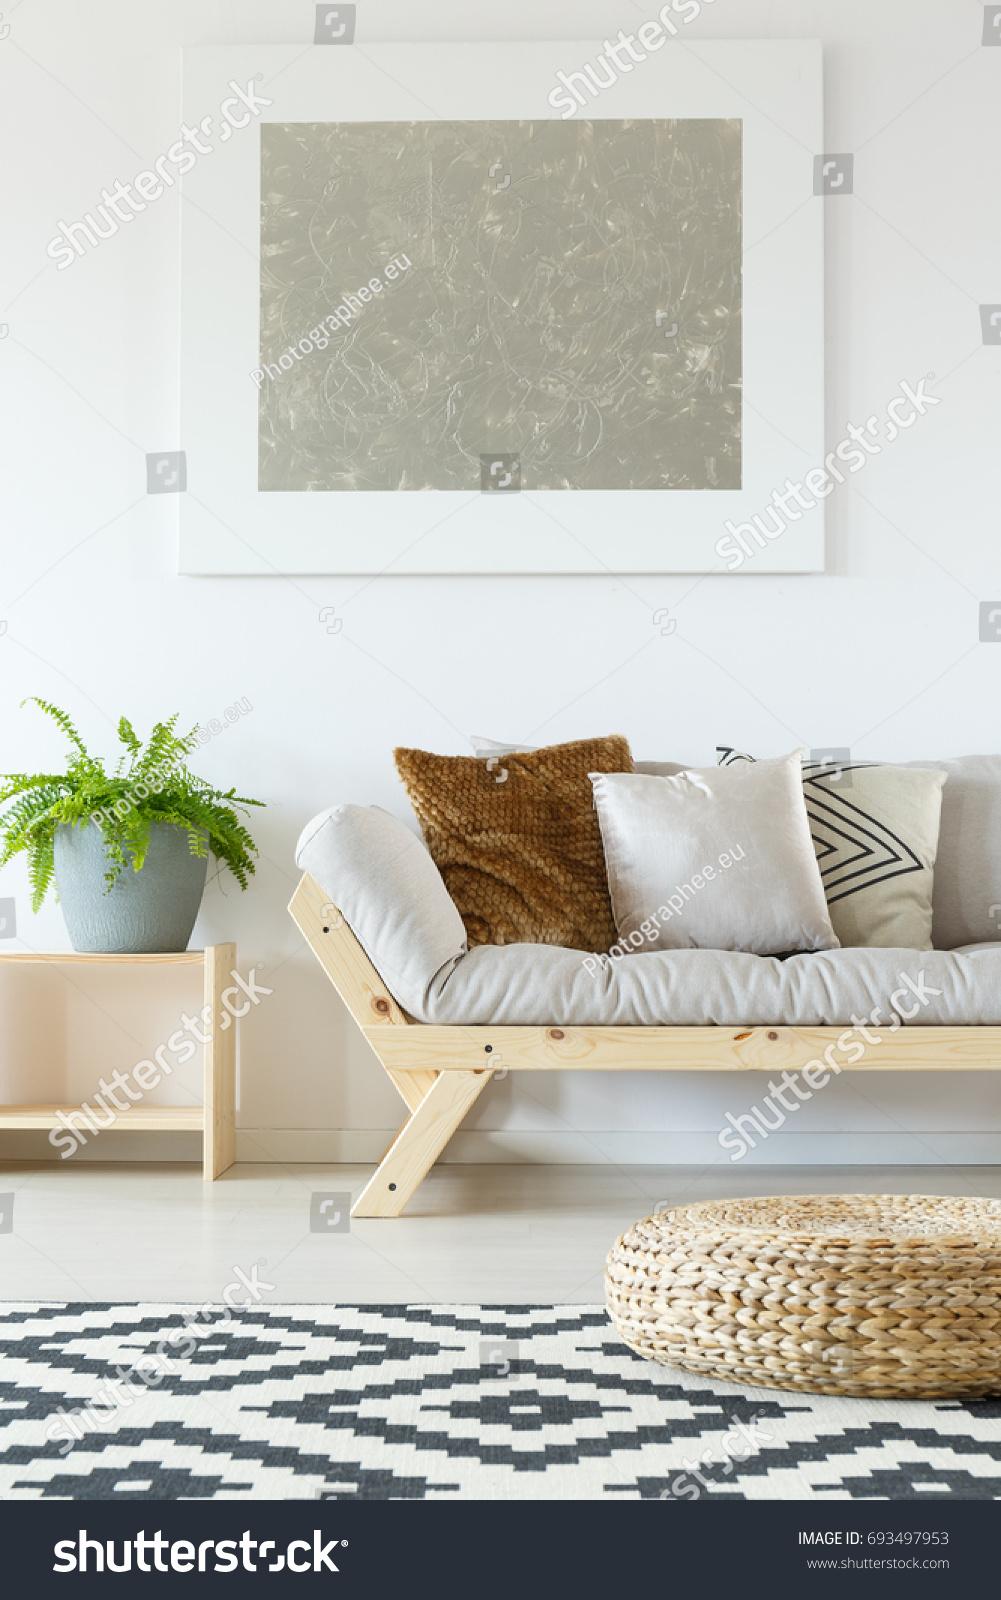 Cozy Interior White Natural Studio Apartment Stock Photo (Royalty ...